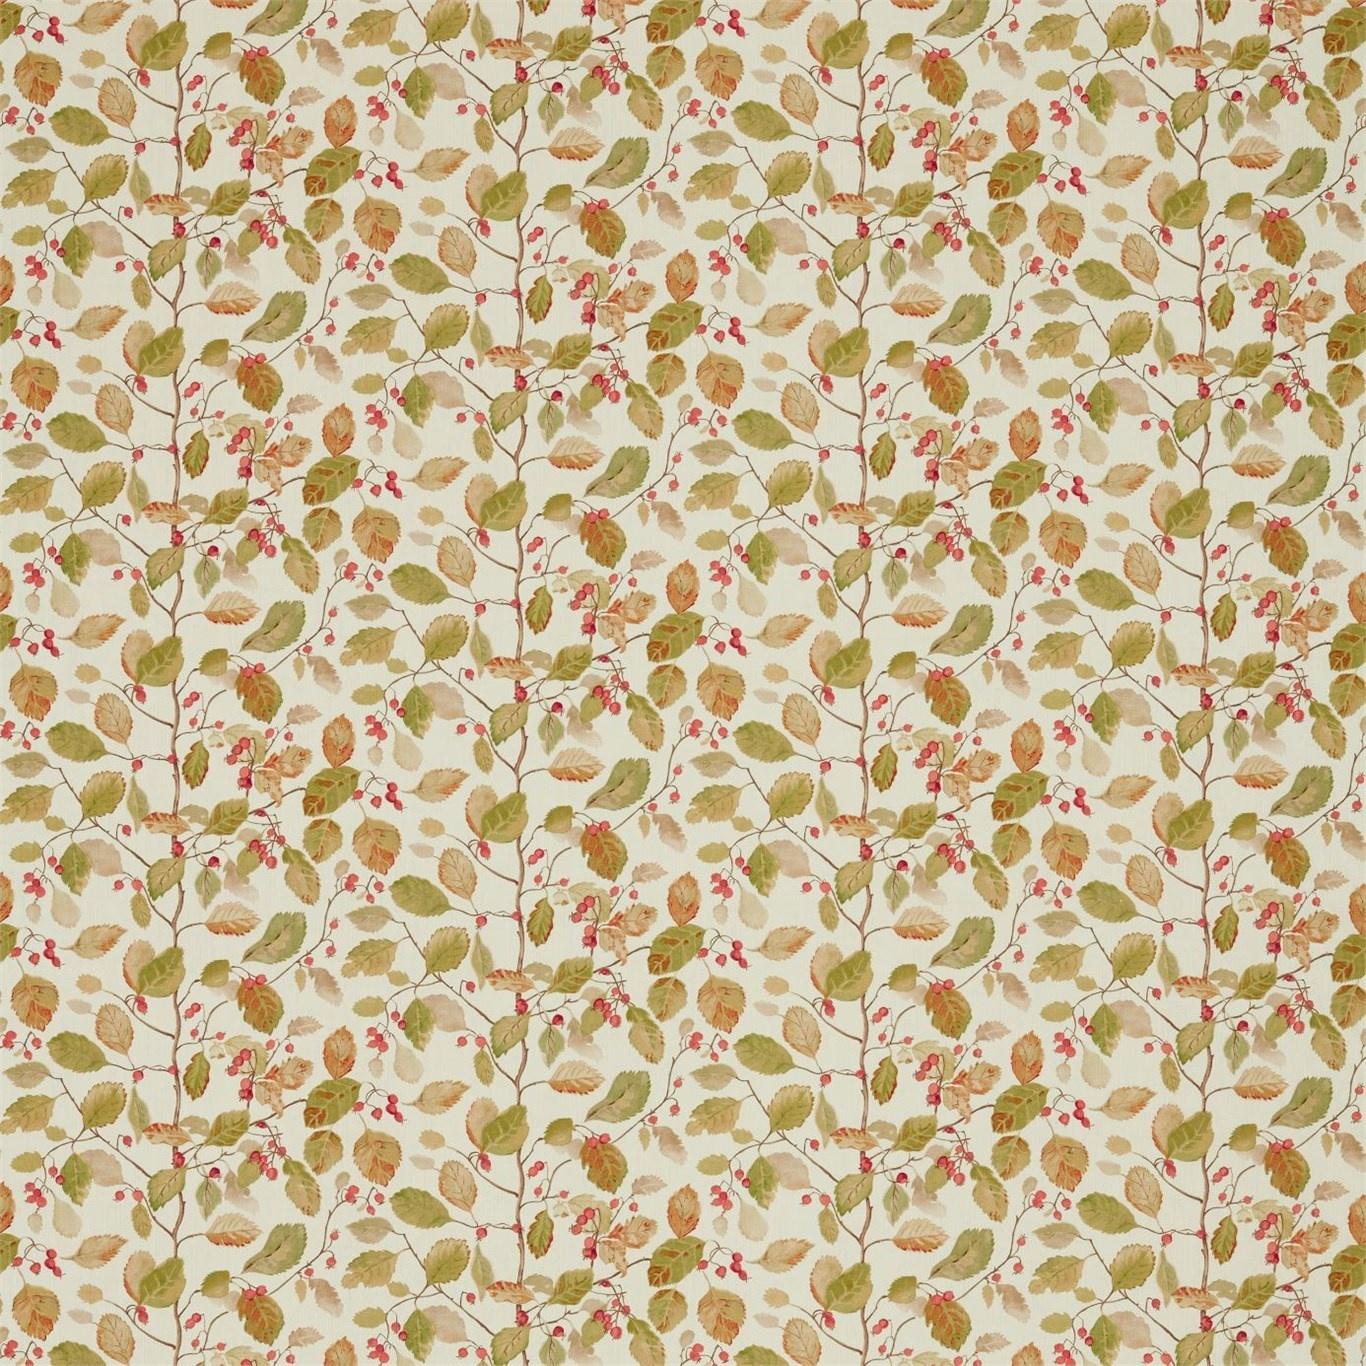 Image of Sanderson Woodland Berries Rosehip/Moss Fabric 225530